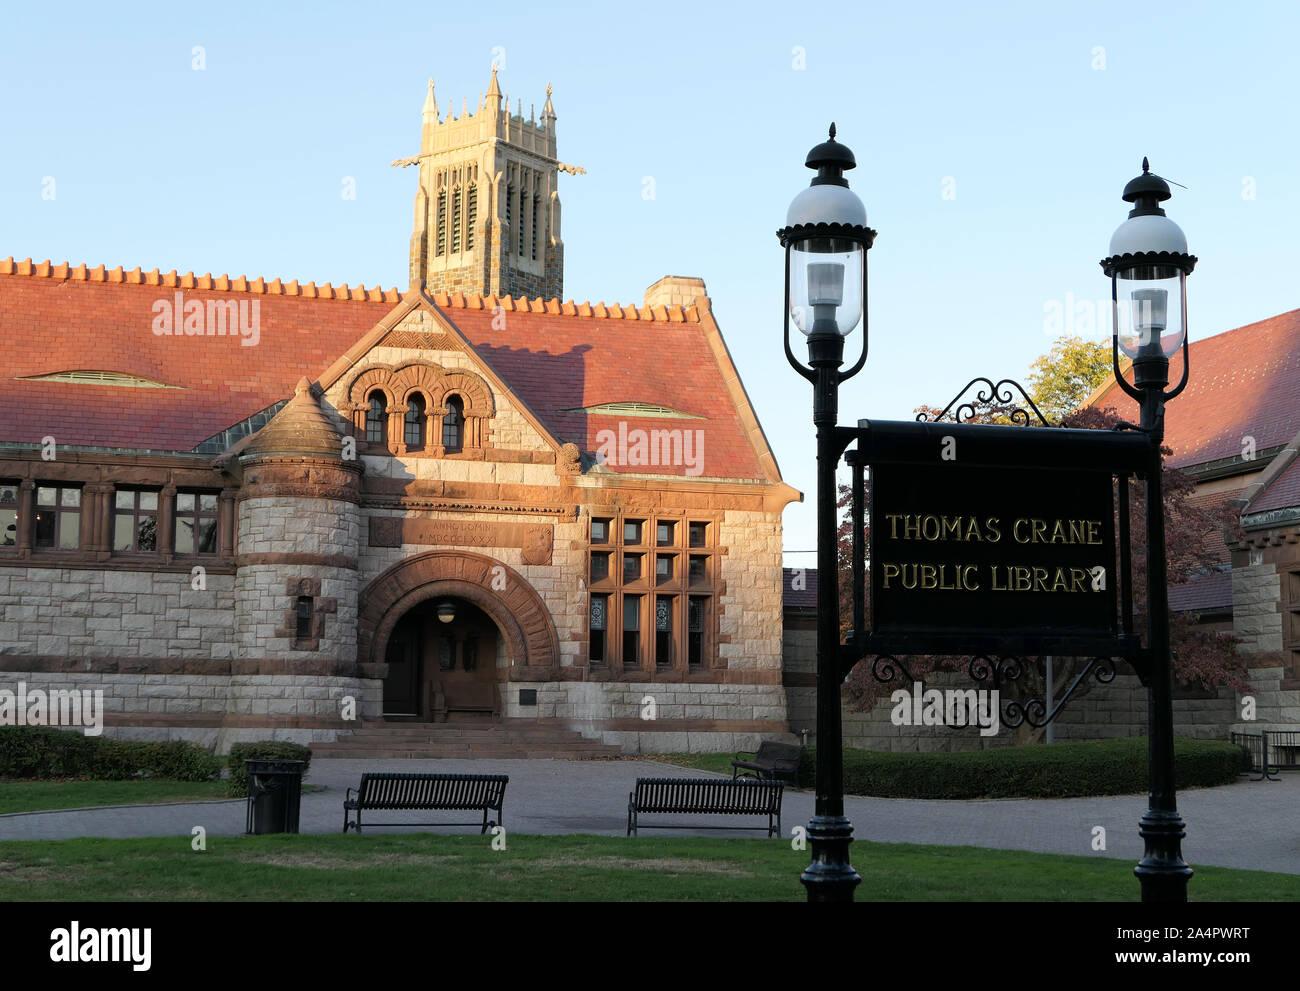 The Thomas Crane Public Library in Quincy Massachusetts Stock Photo